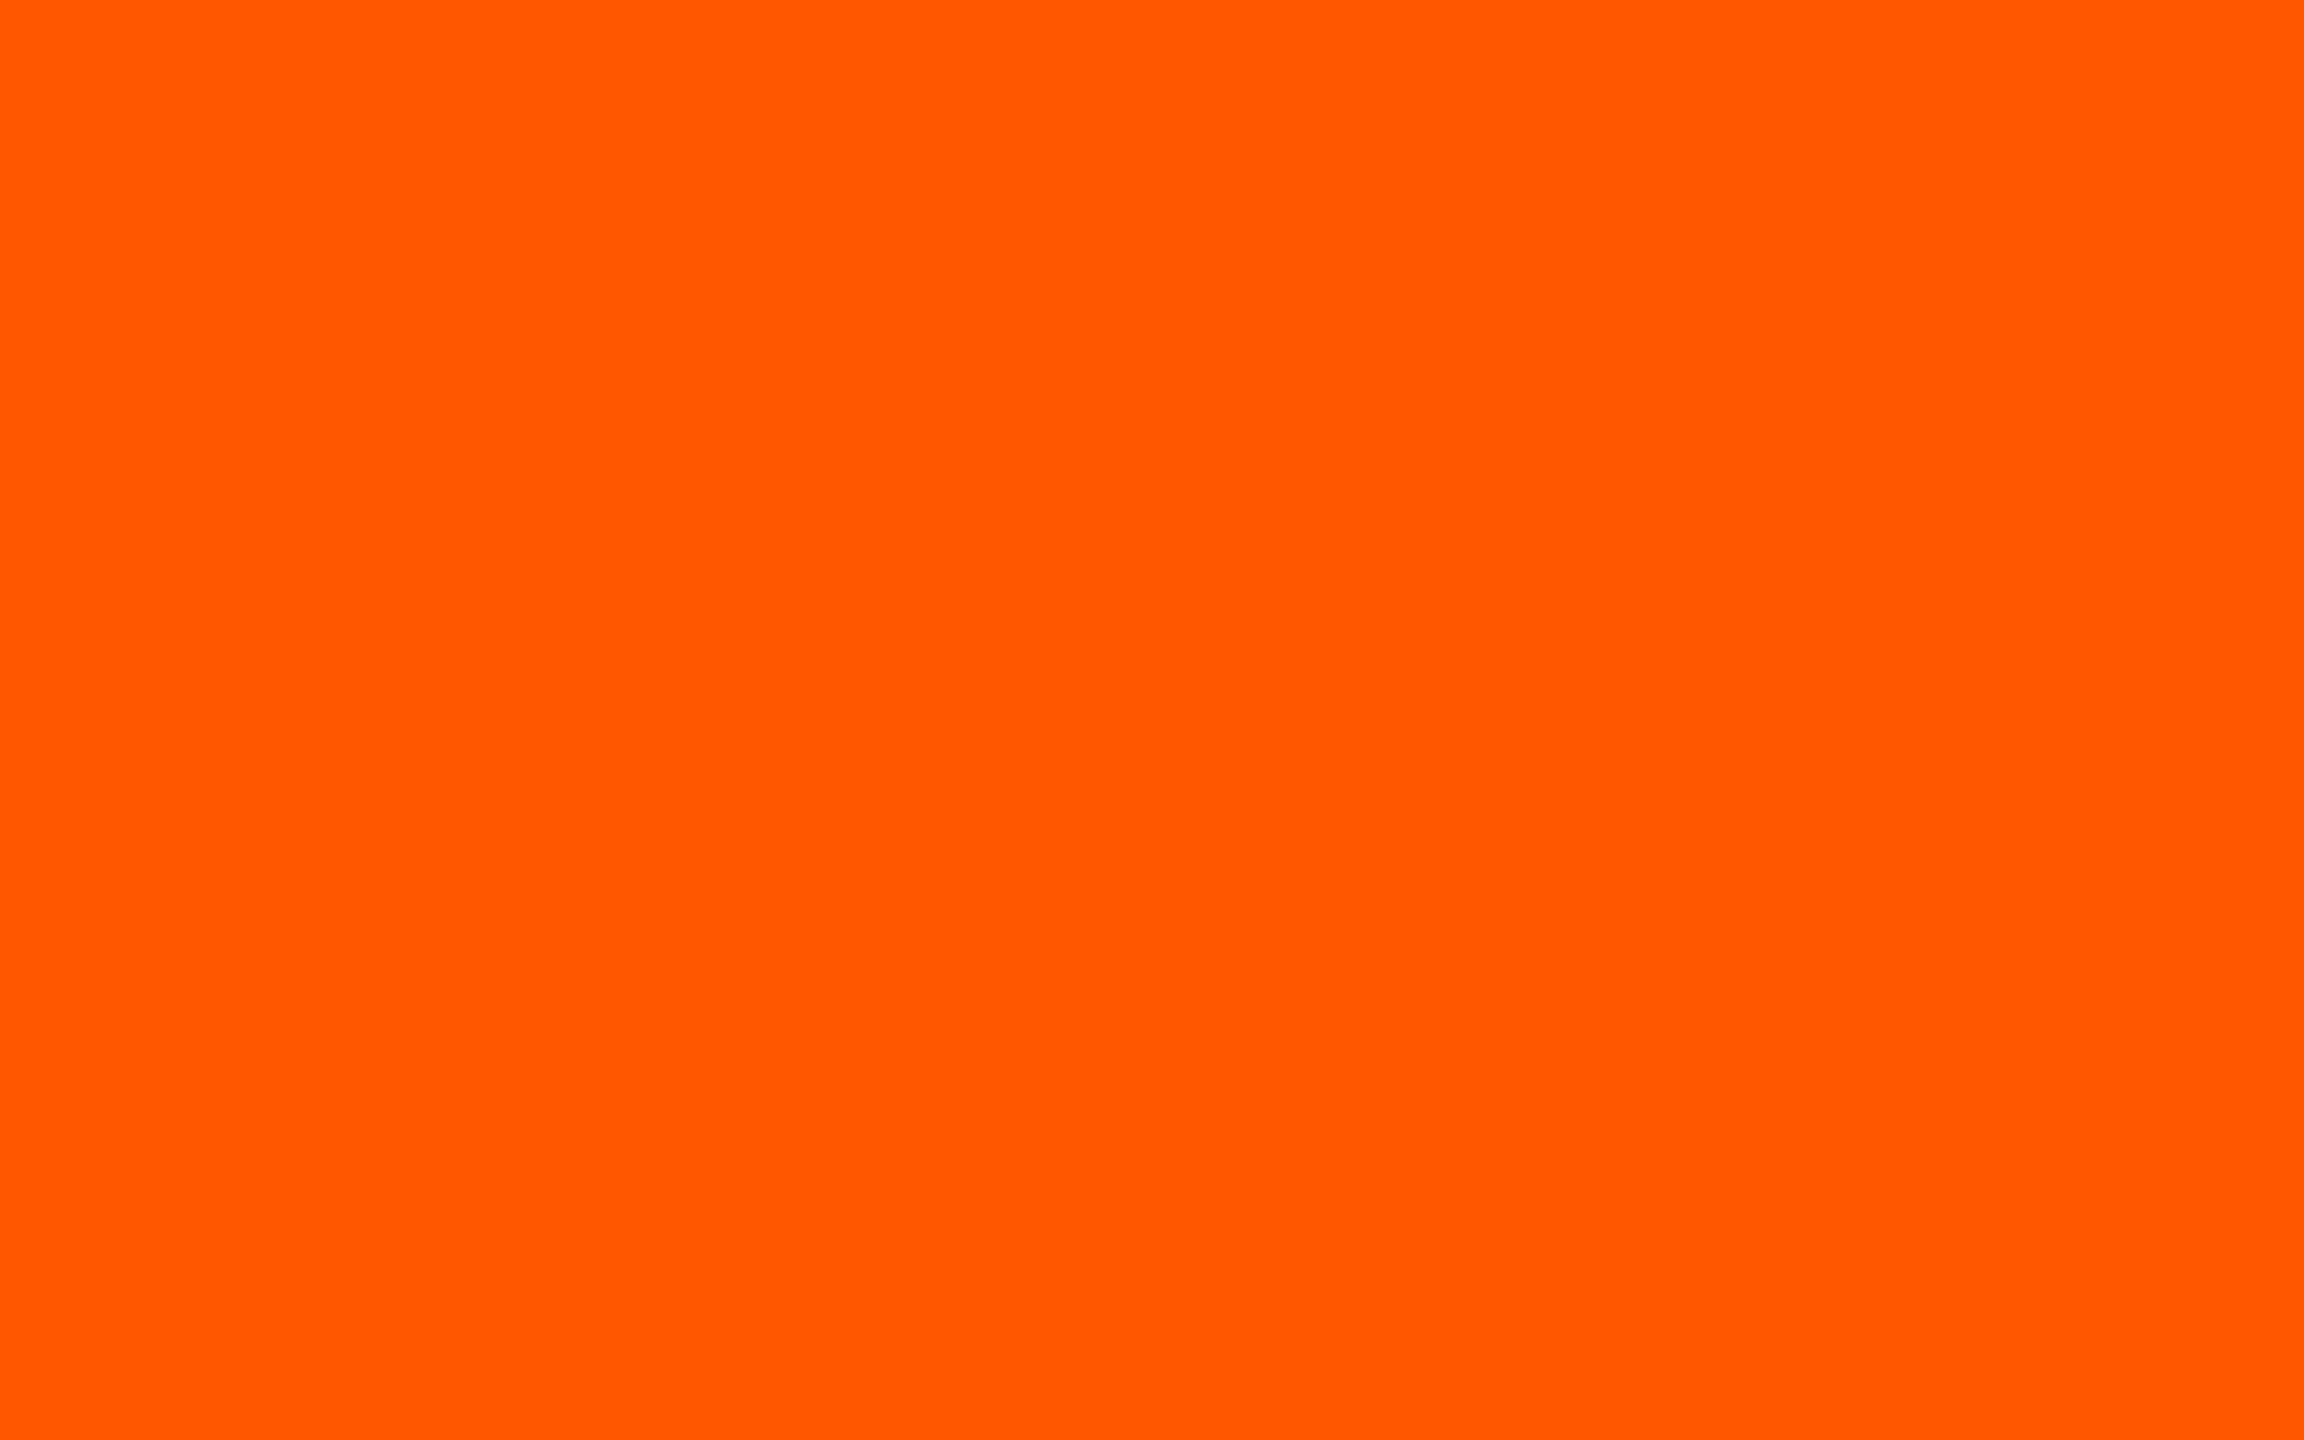 2304x1440 Orange Pantone Solid Color Background